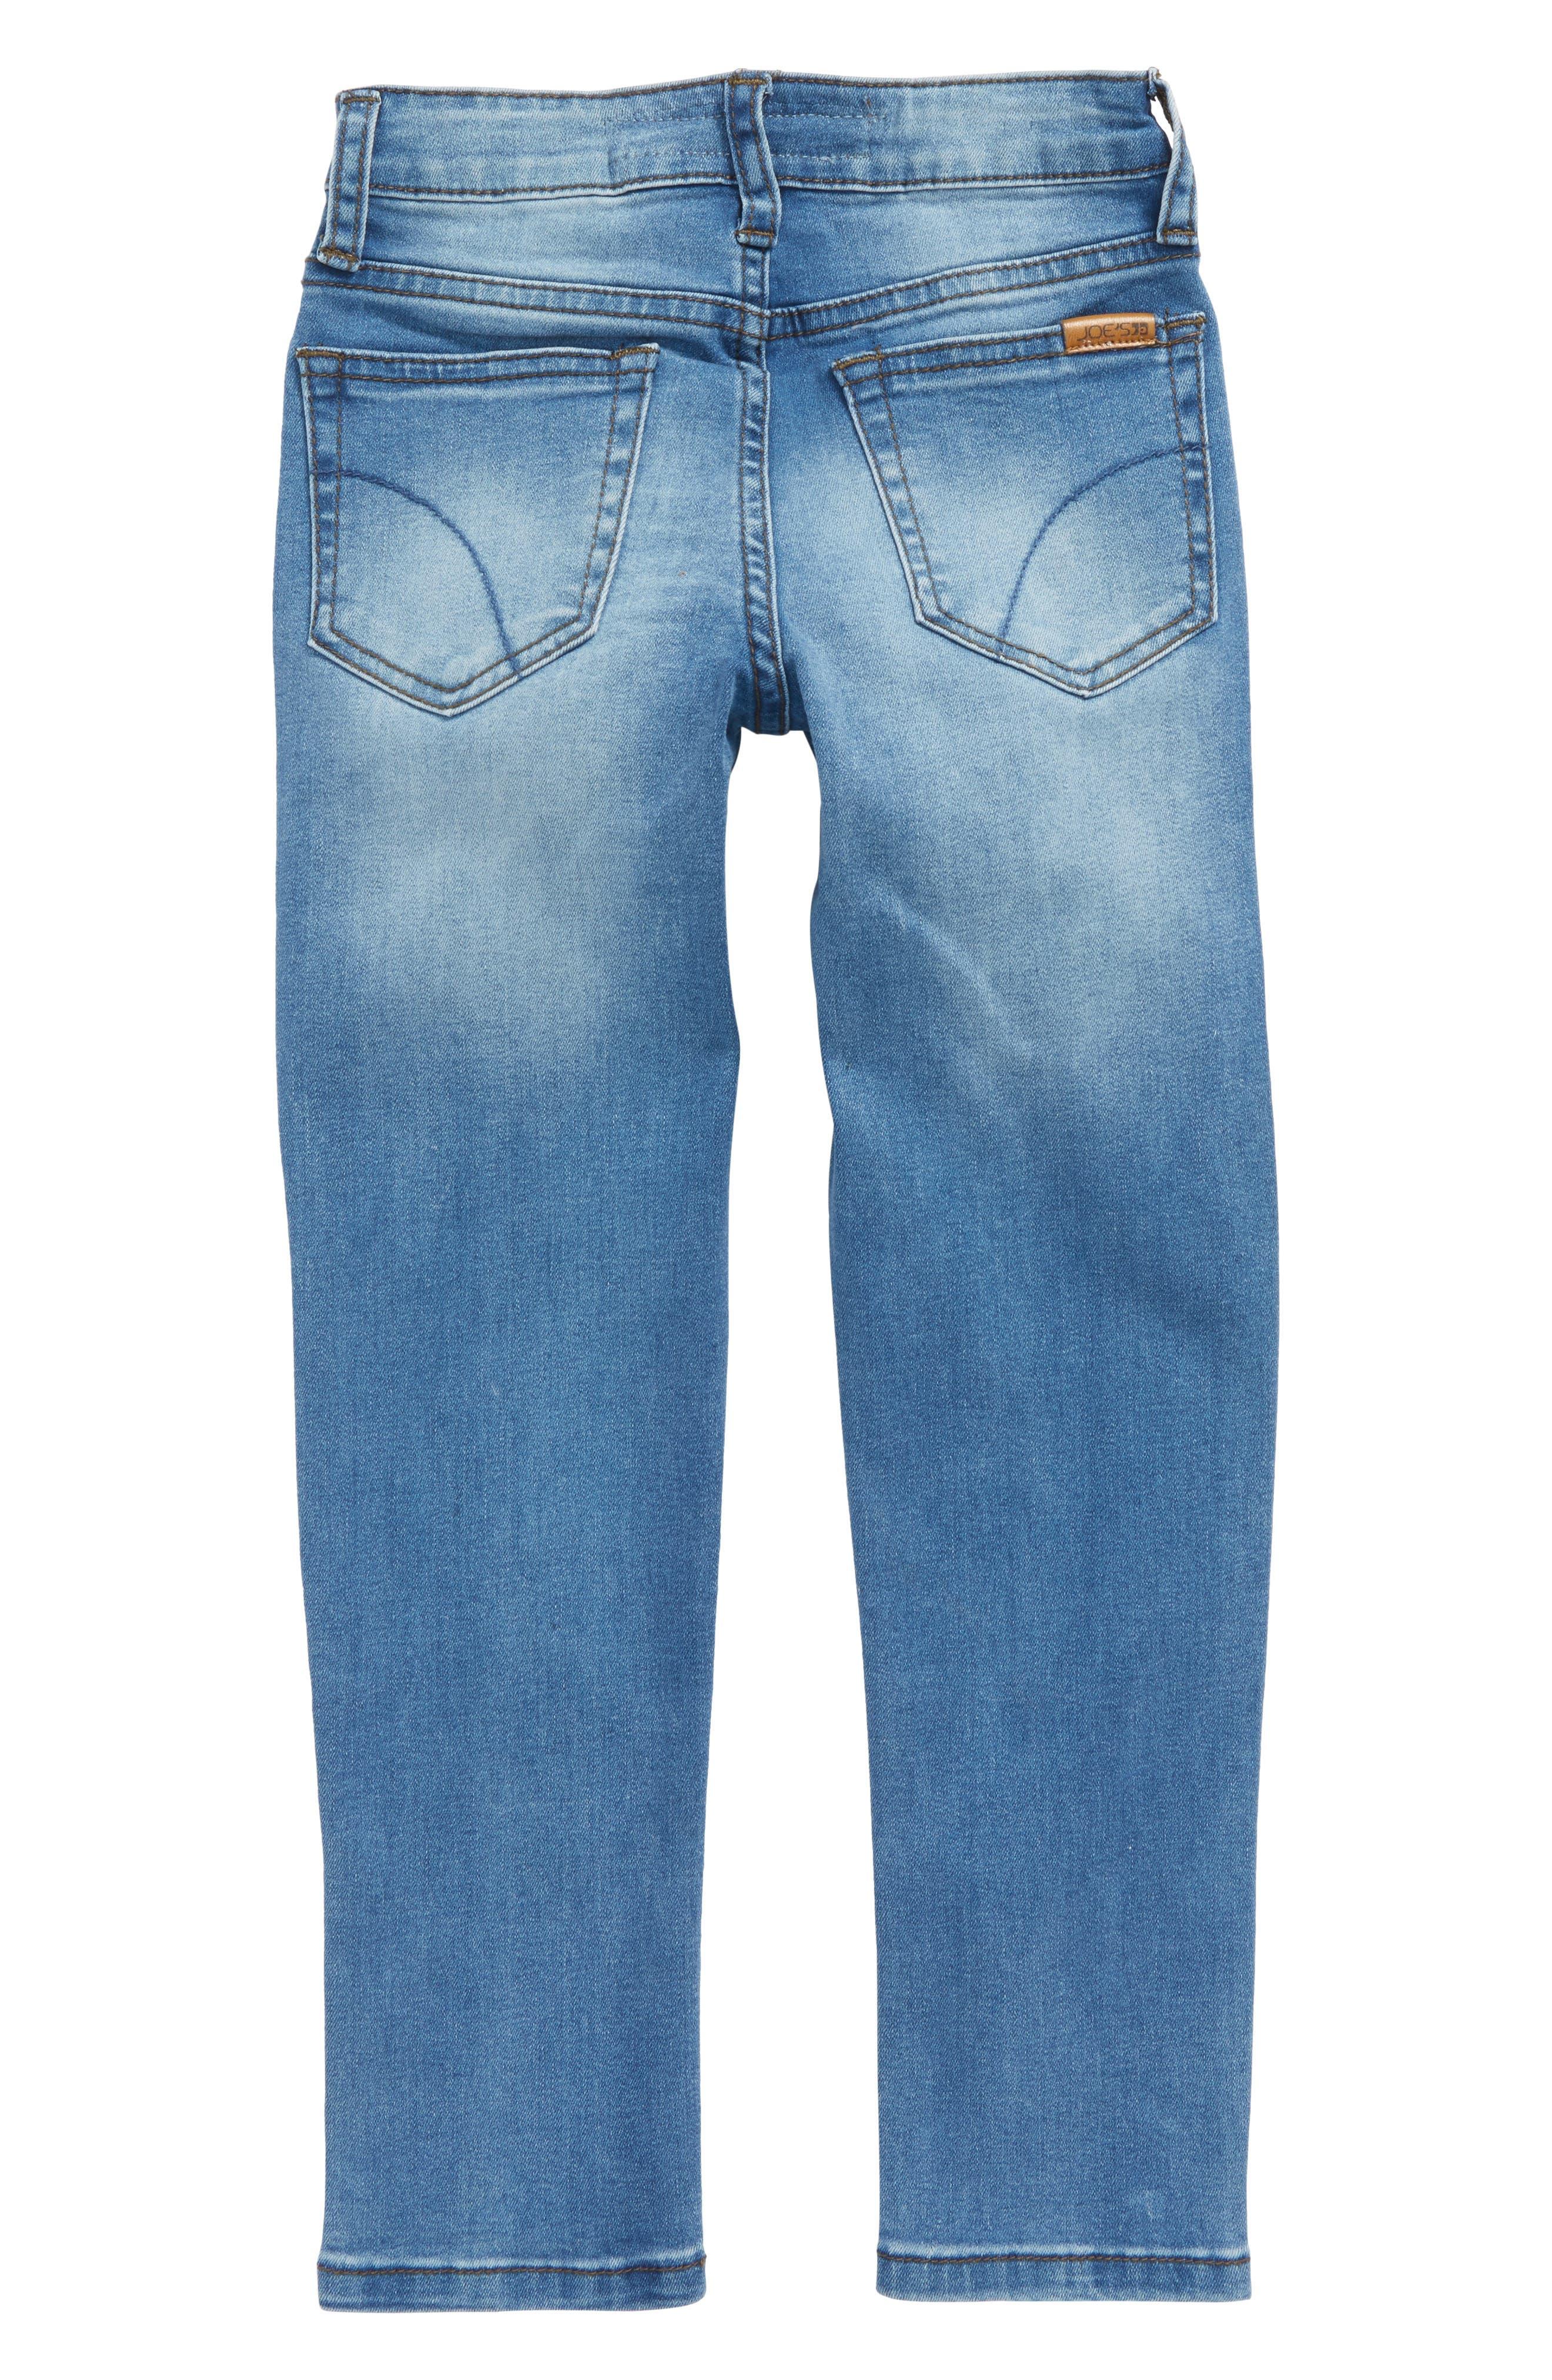 Alternate Image 2  - Joe's Rad Slim Fit Stretch Jeans (Toddler Boys & Little Boys)